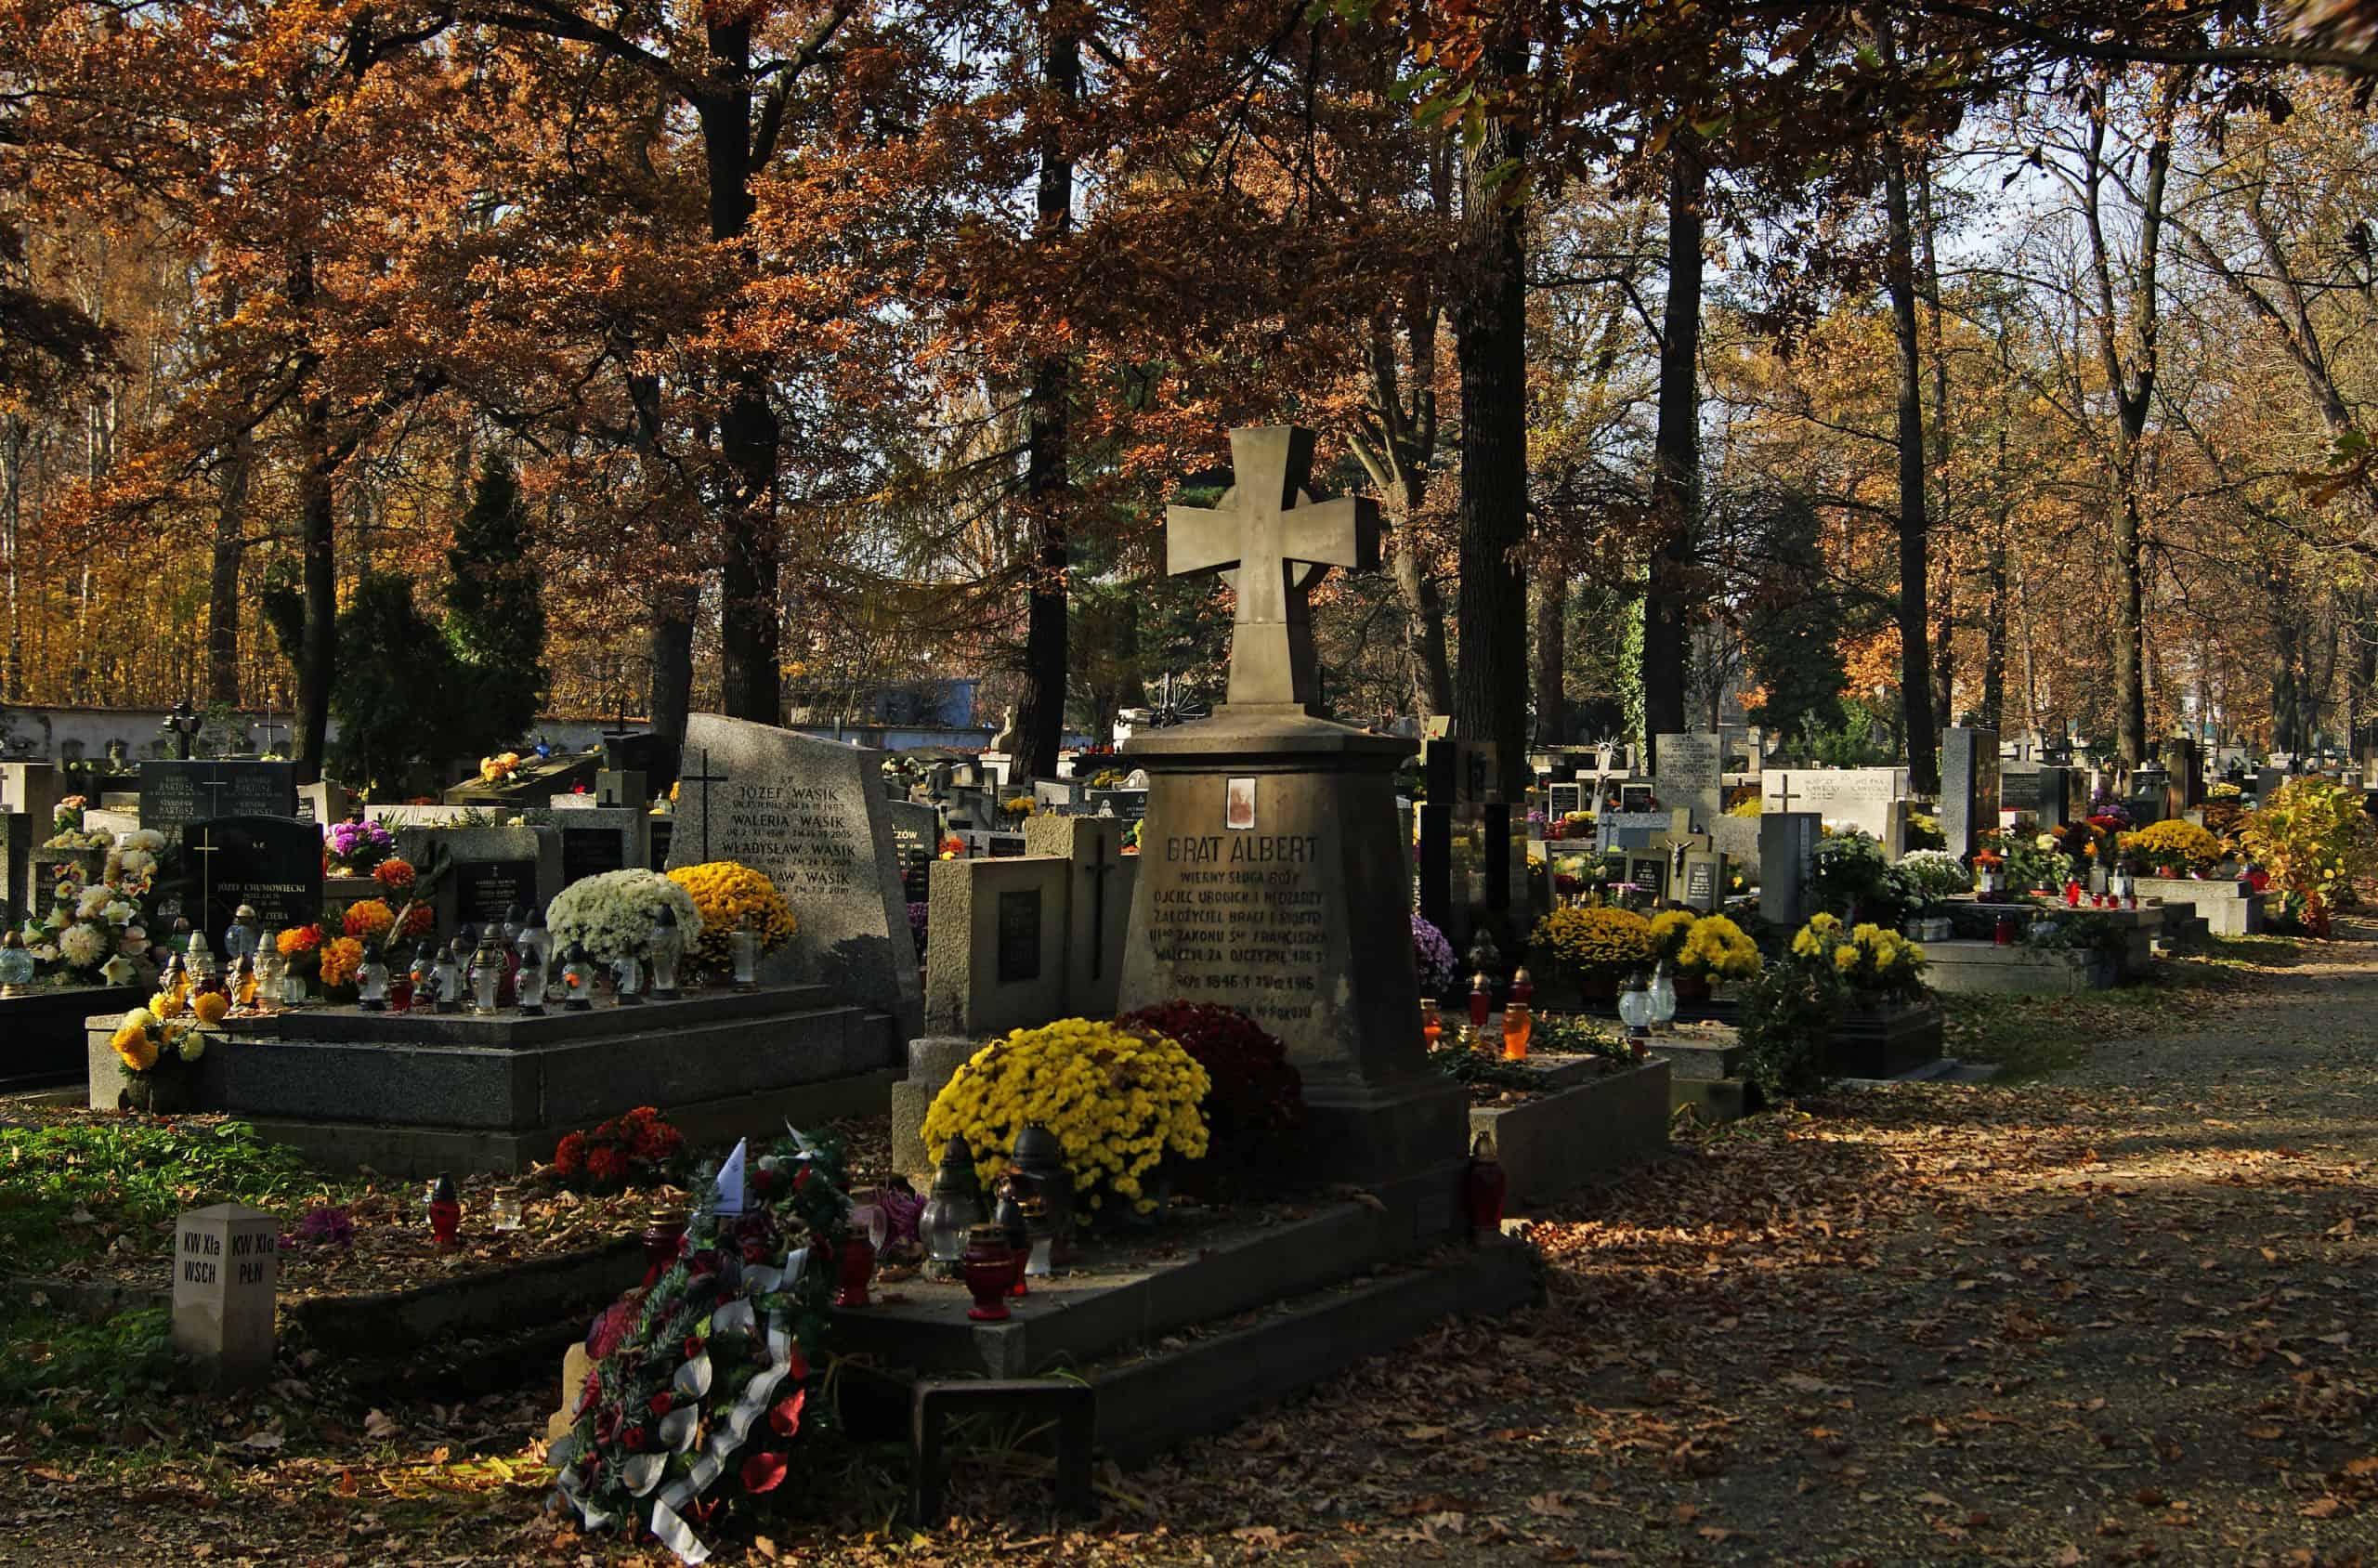 Grób św brata alberta cmentarz rakowcki kraków